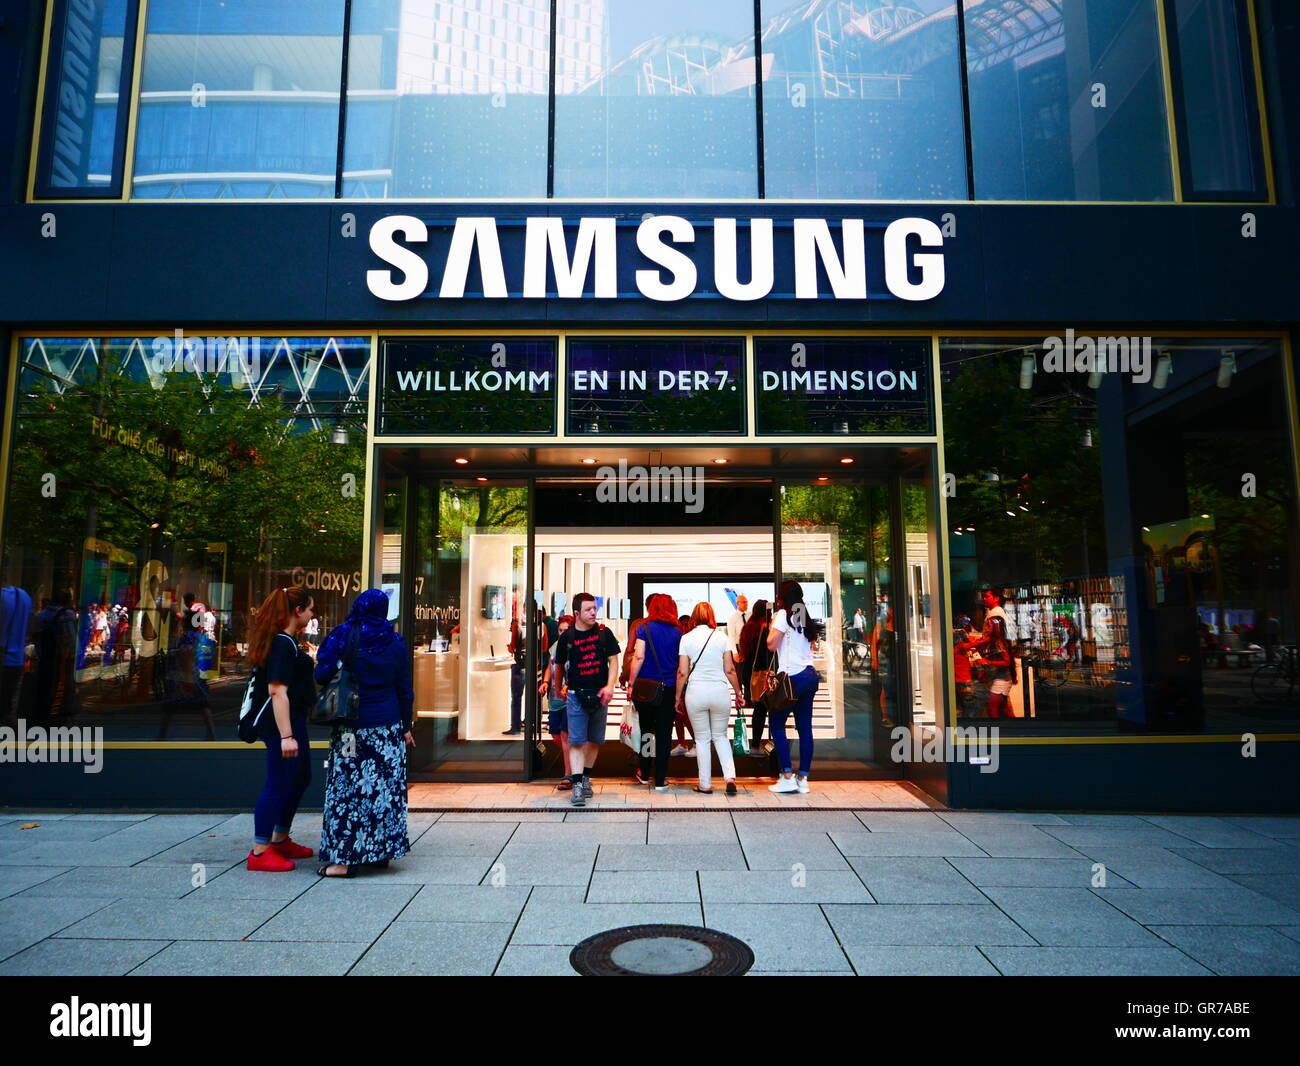 Samsung flagship store in Zeil Frankfurt am Main Germany - Stock Image